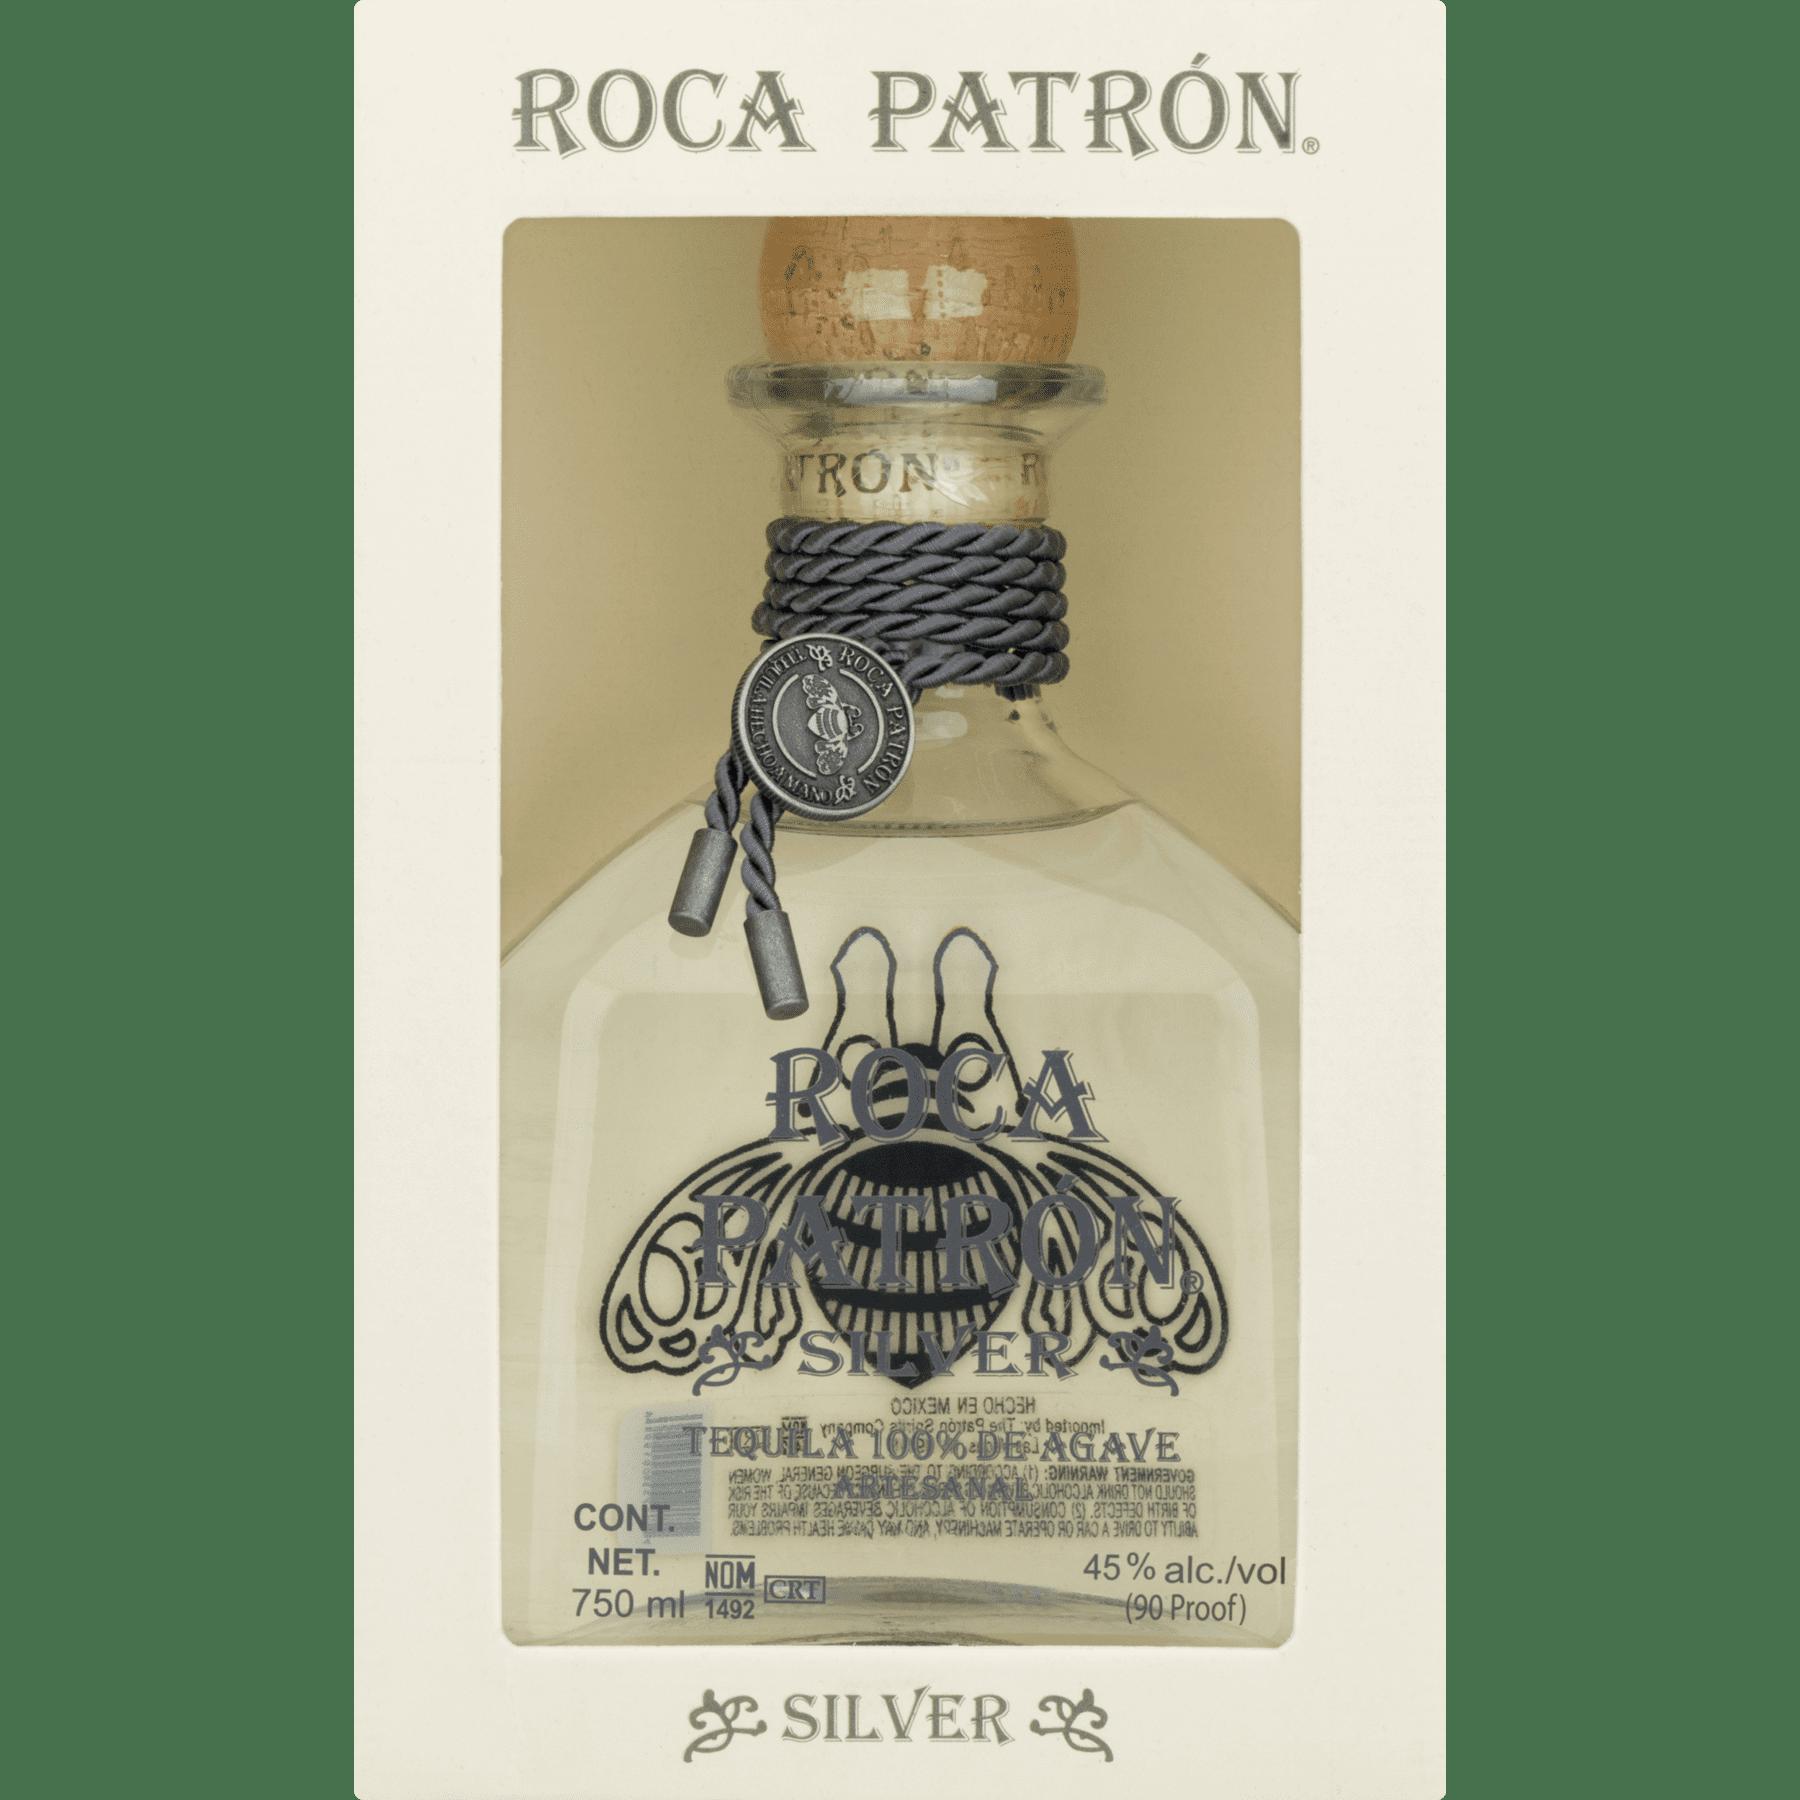 Patron Tequila Silver - Box, 750.0 ML - Walmart.com